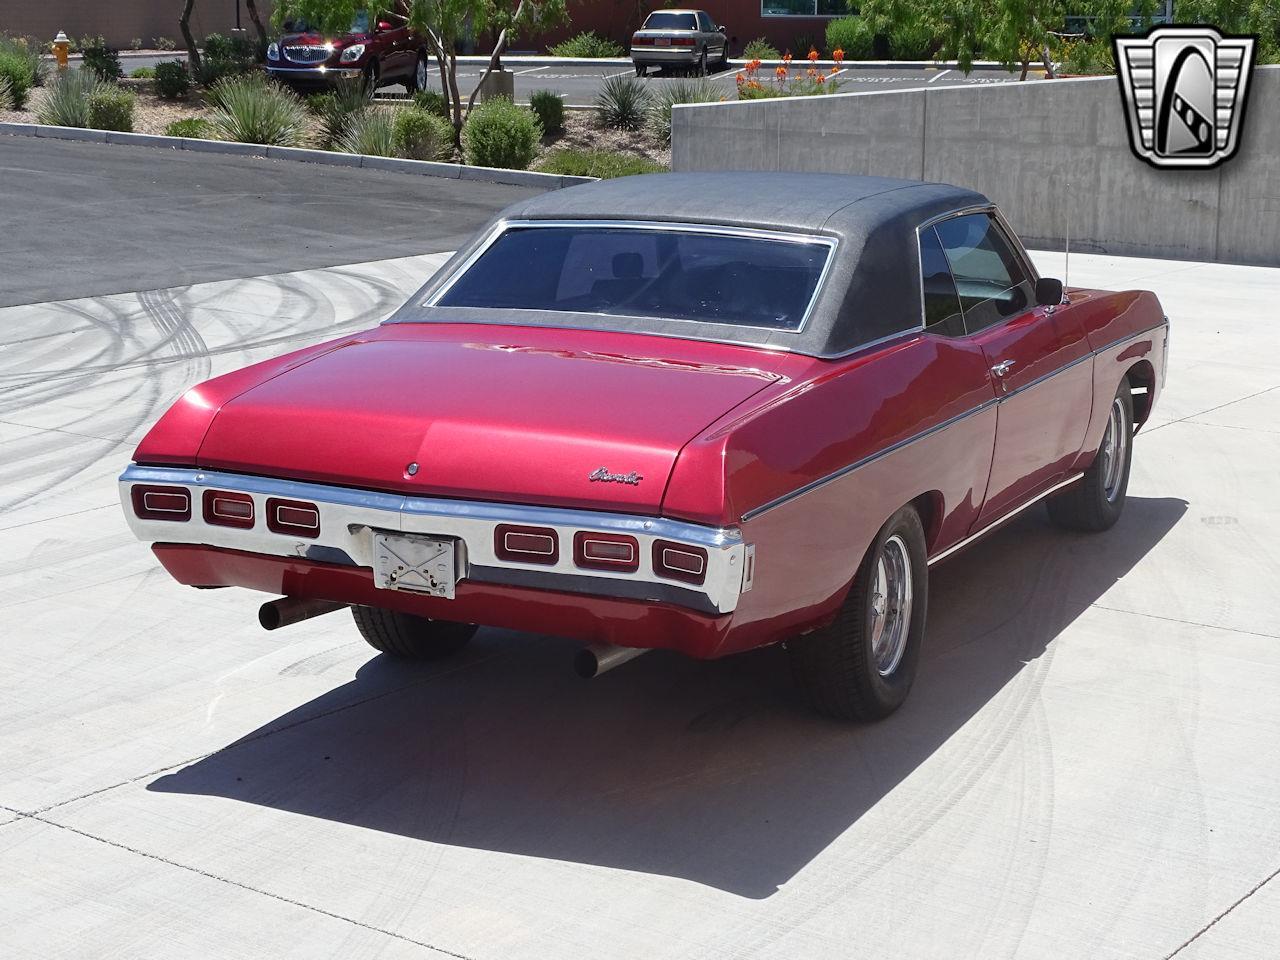 1969 Chevrolet Impala (CC-1375500) for sale in O'Fallon, Illinois